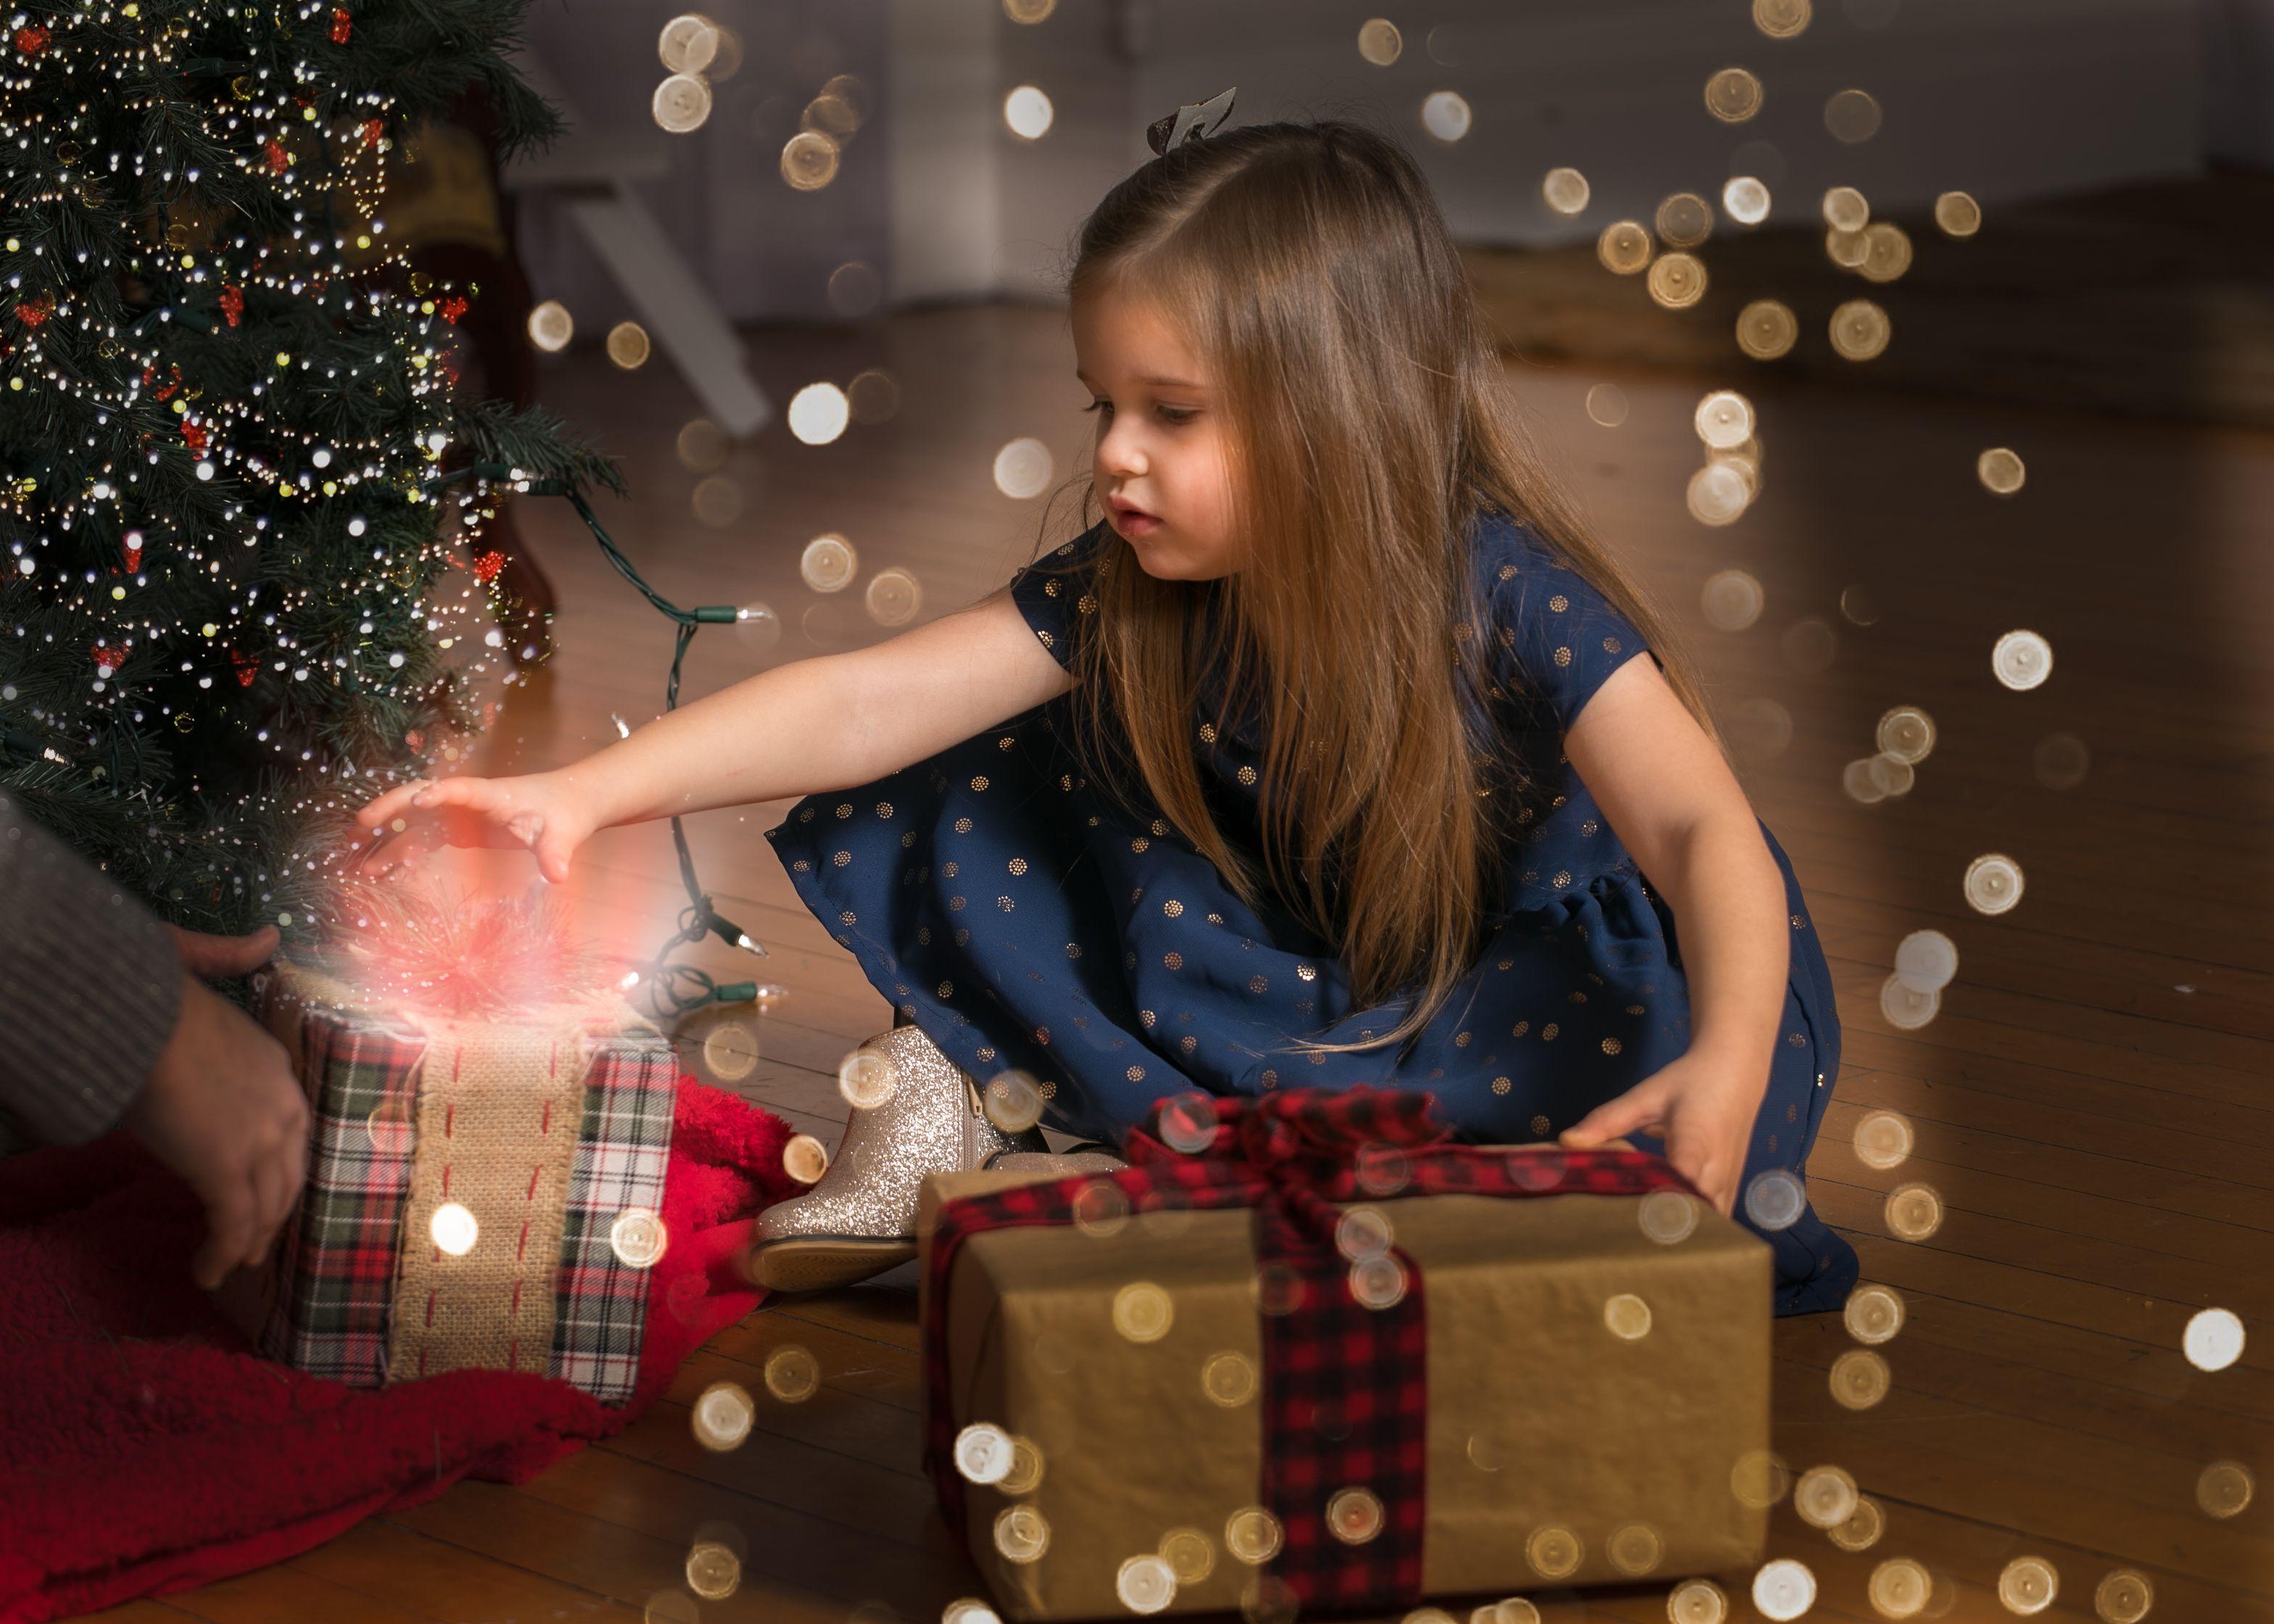 Little Girl Photo Session #daddyandson #portraitsession #portraitphotography #canon #camera #lens #nikon #photographer #photography #instagood #instagoodmyphoto #instagoodies #instadaily #instadailyphoto #instadailypic #photooftheday #photographyeveryday